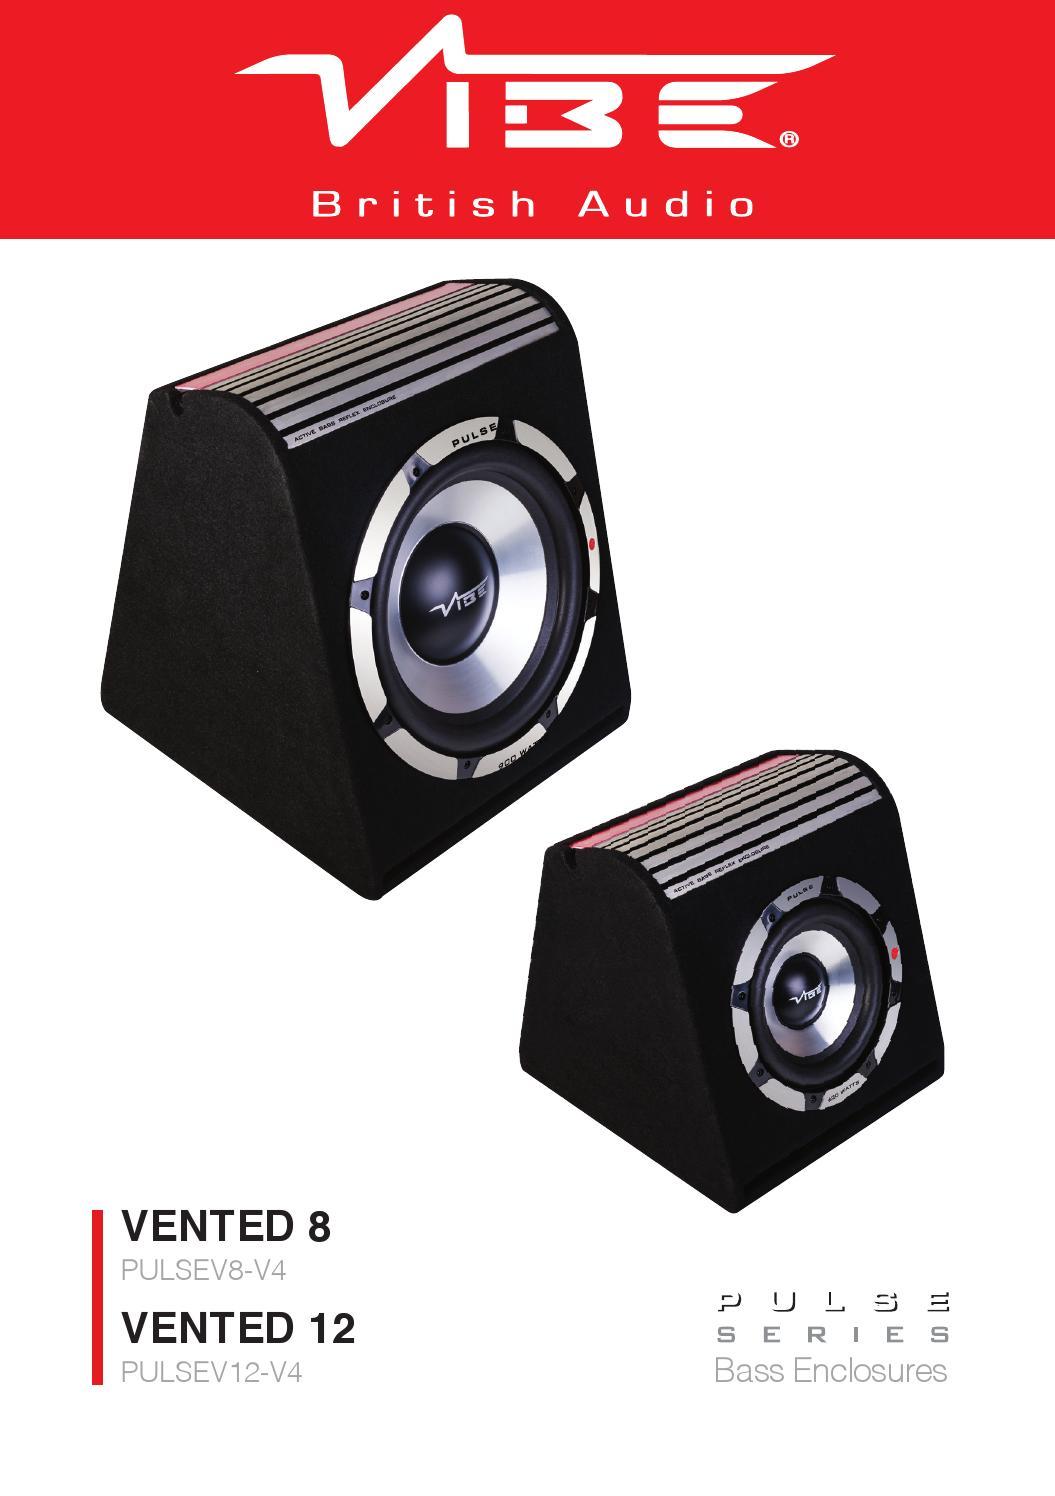 Vibe Optisound Auto 8 Wiring Diagram Kit Instructions Pulse V12 V8 Manual By Audio Issuu Diagrams Isuzu Ignition Switch